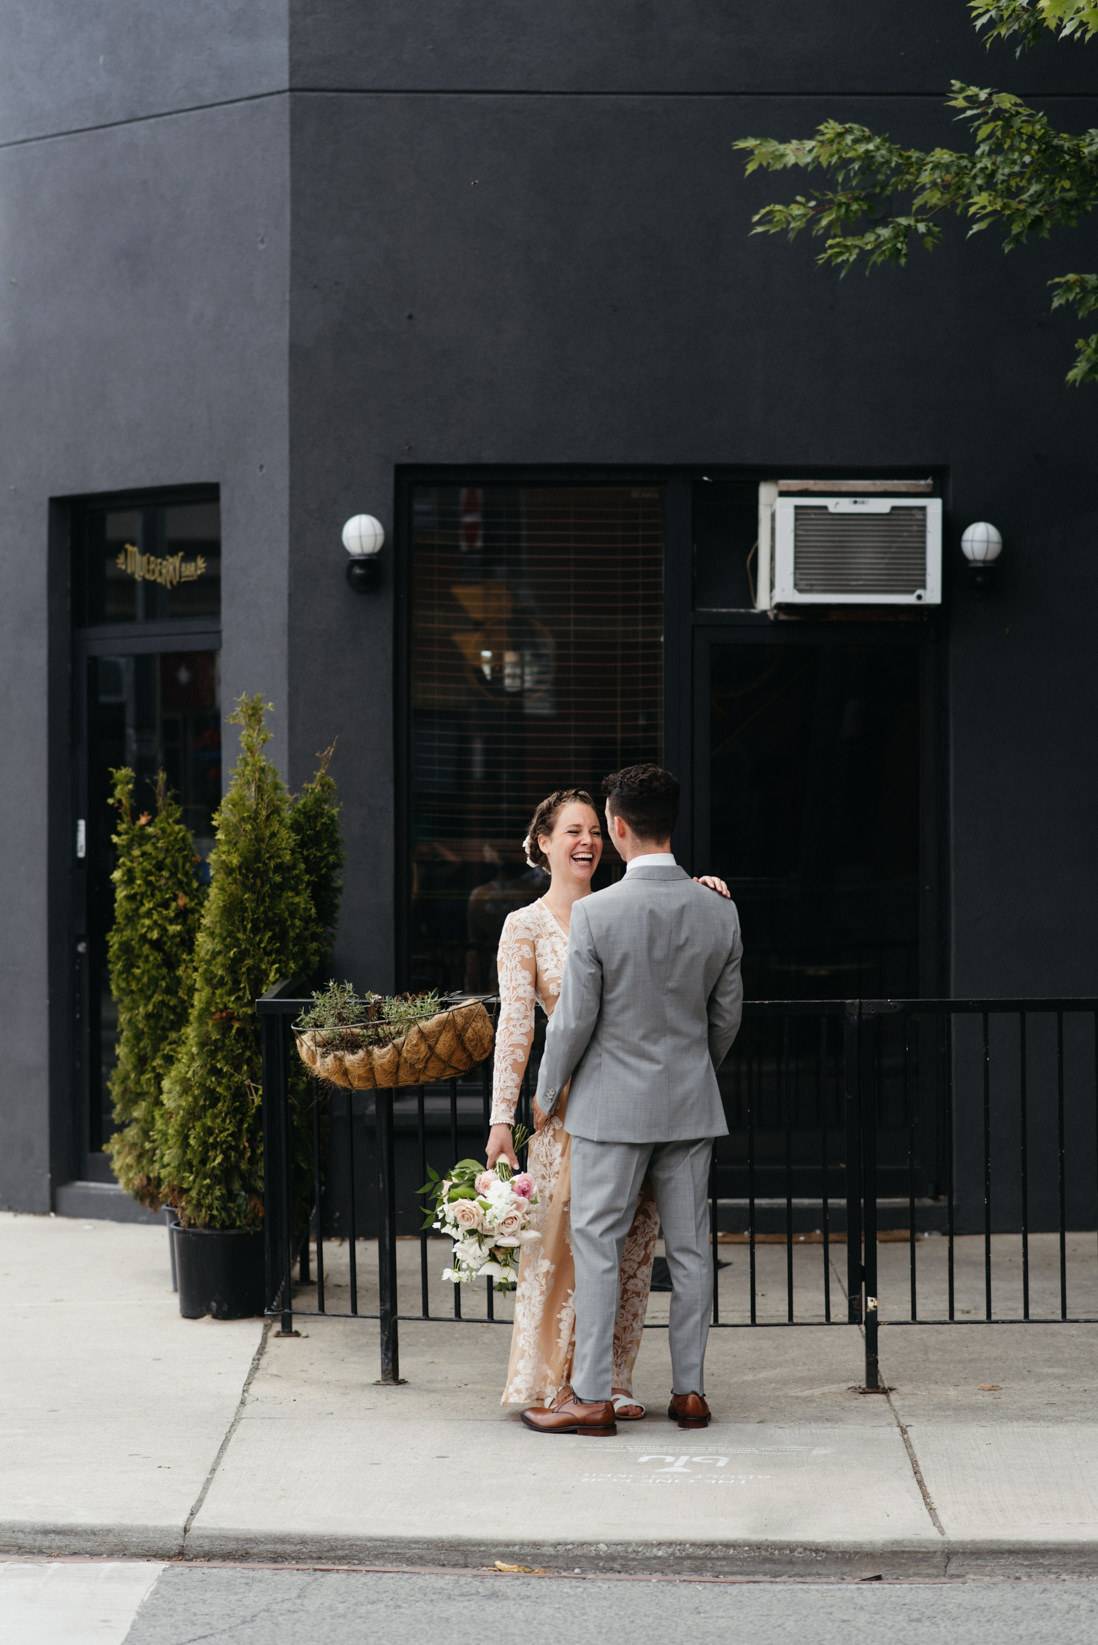 streetside wedding portraits toronto dovercourt park duffering grove_EightyFifth Street Photography